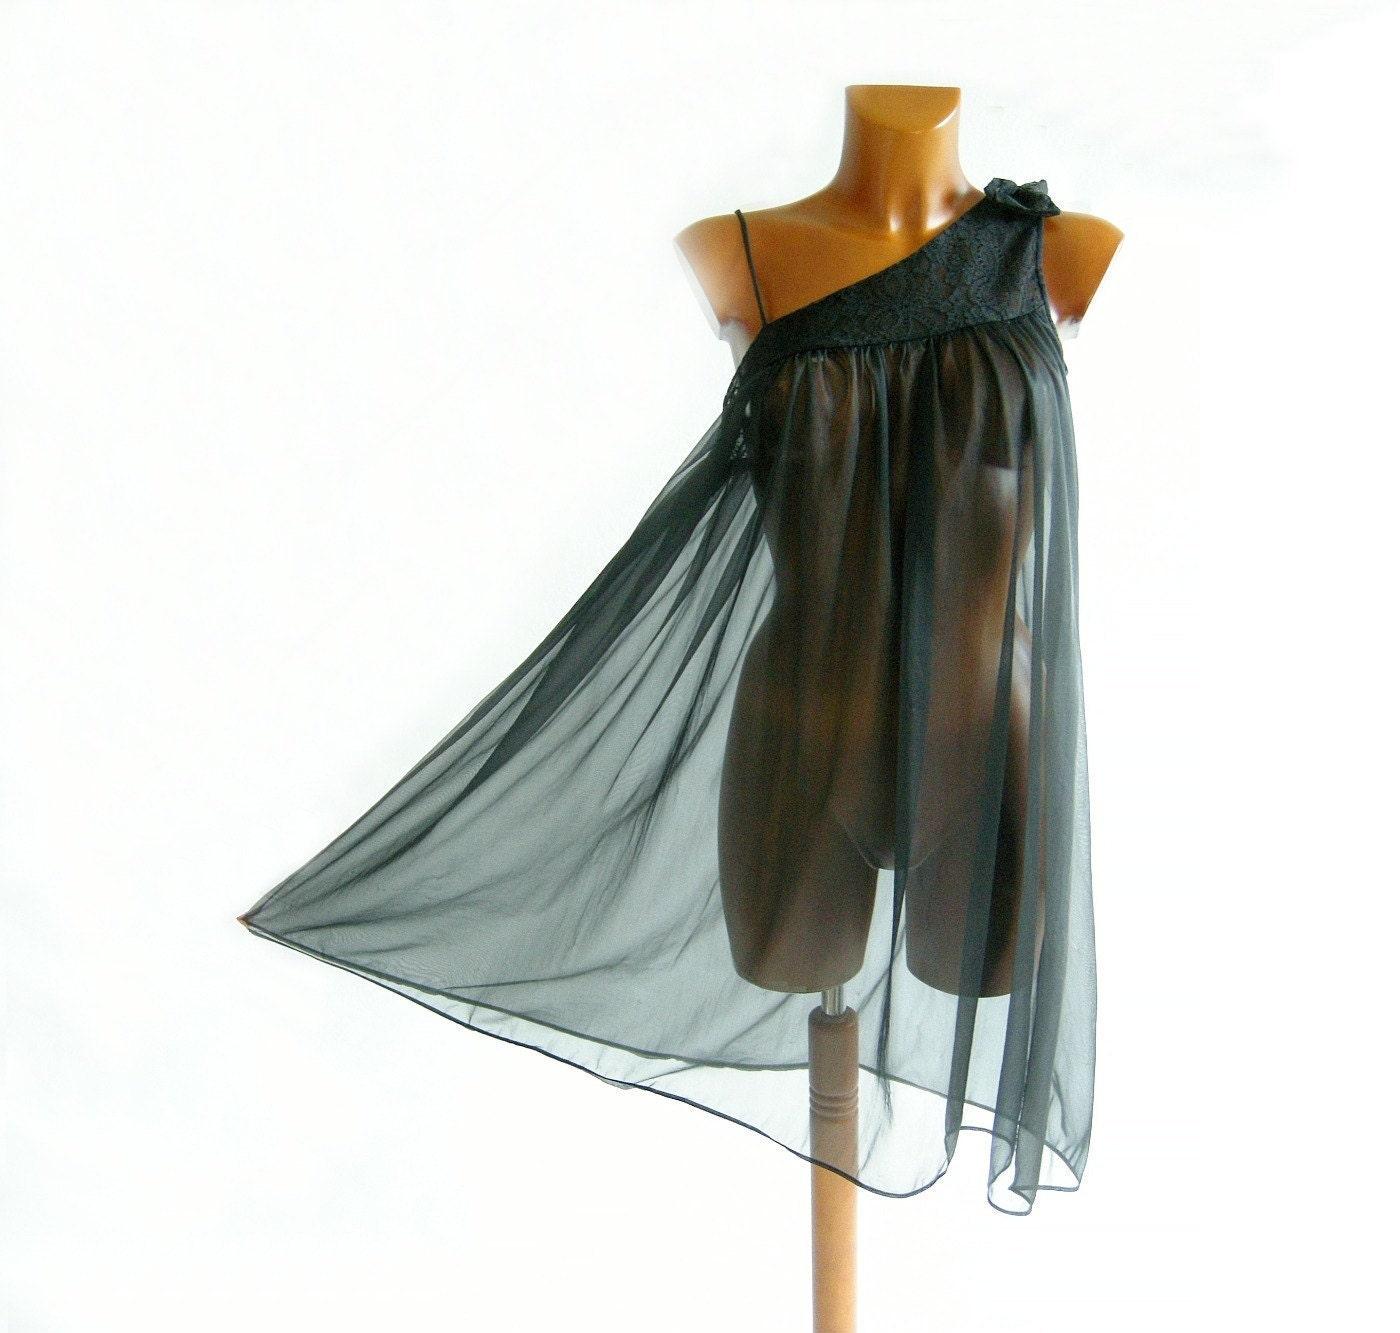 Vintage 60s Black Chiffon Babydoll Nightgown S M Negligee See Thru Asymmetrical - empressjade